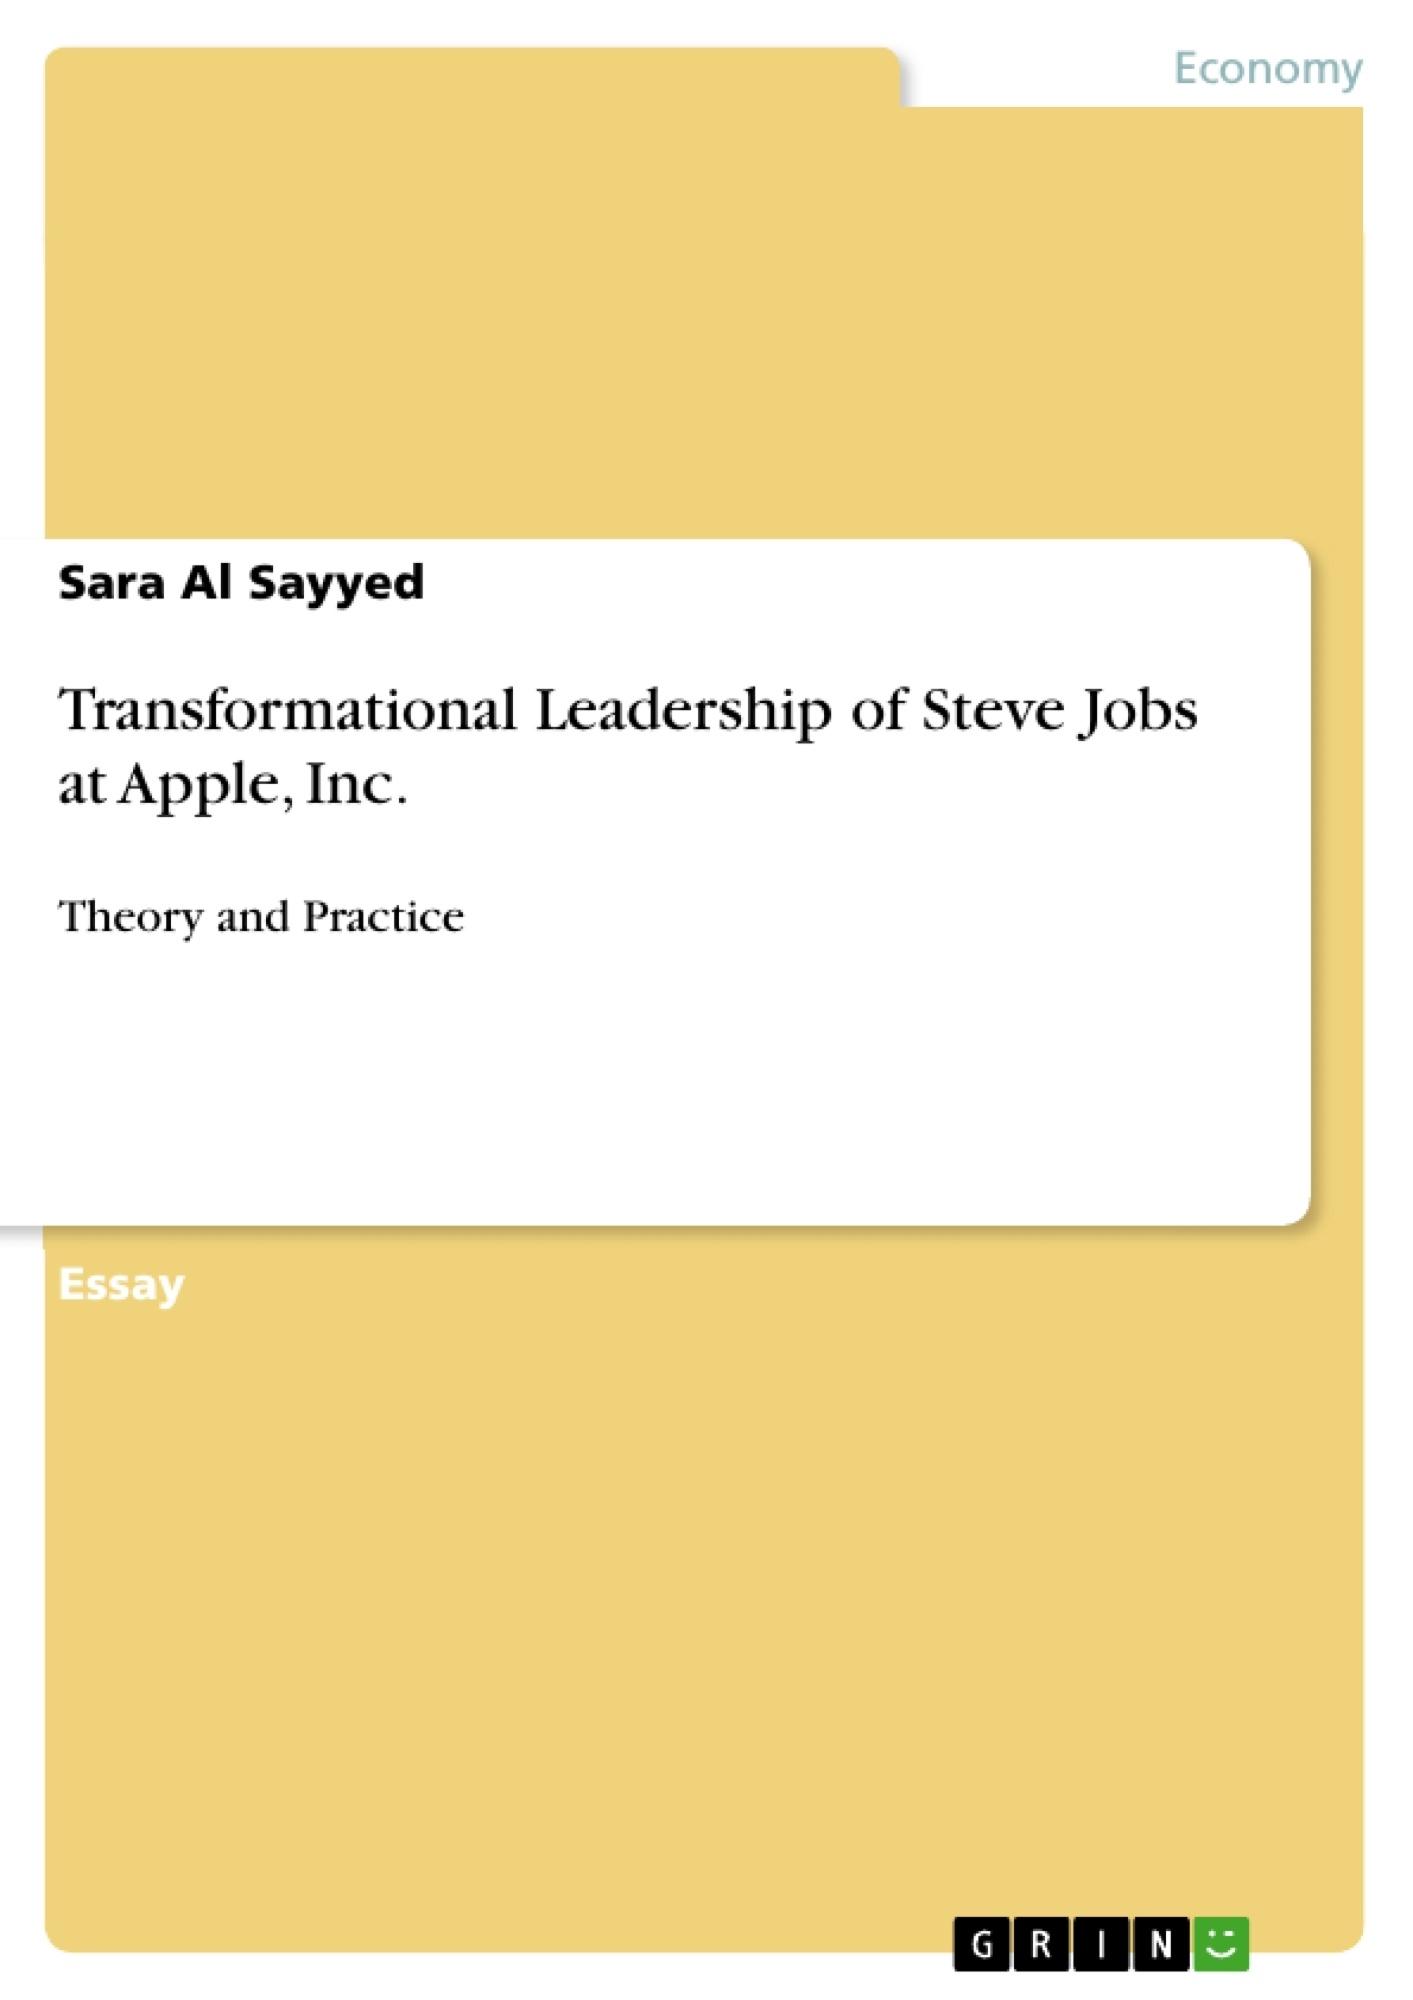 Title: Transformational Leadership of Steve Jobs at Apple, Inc.